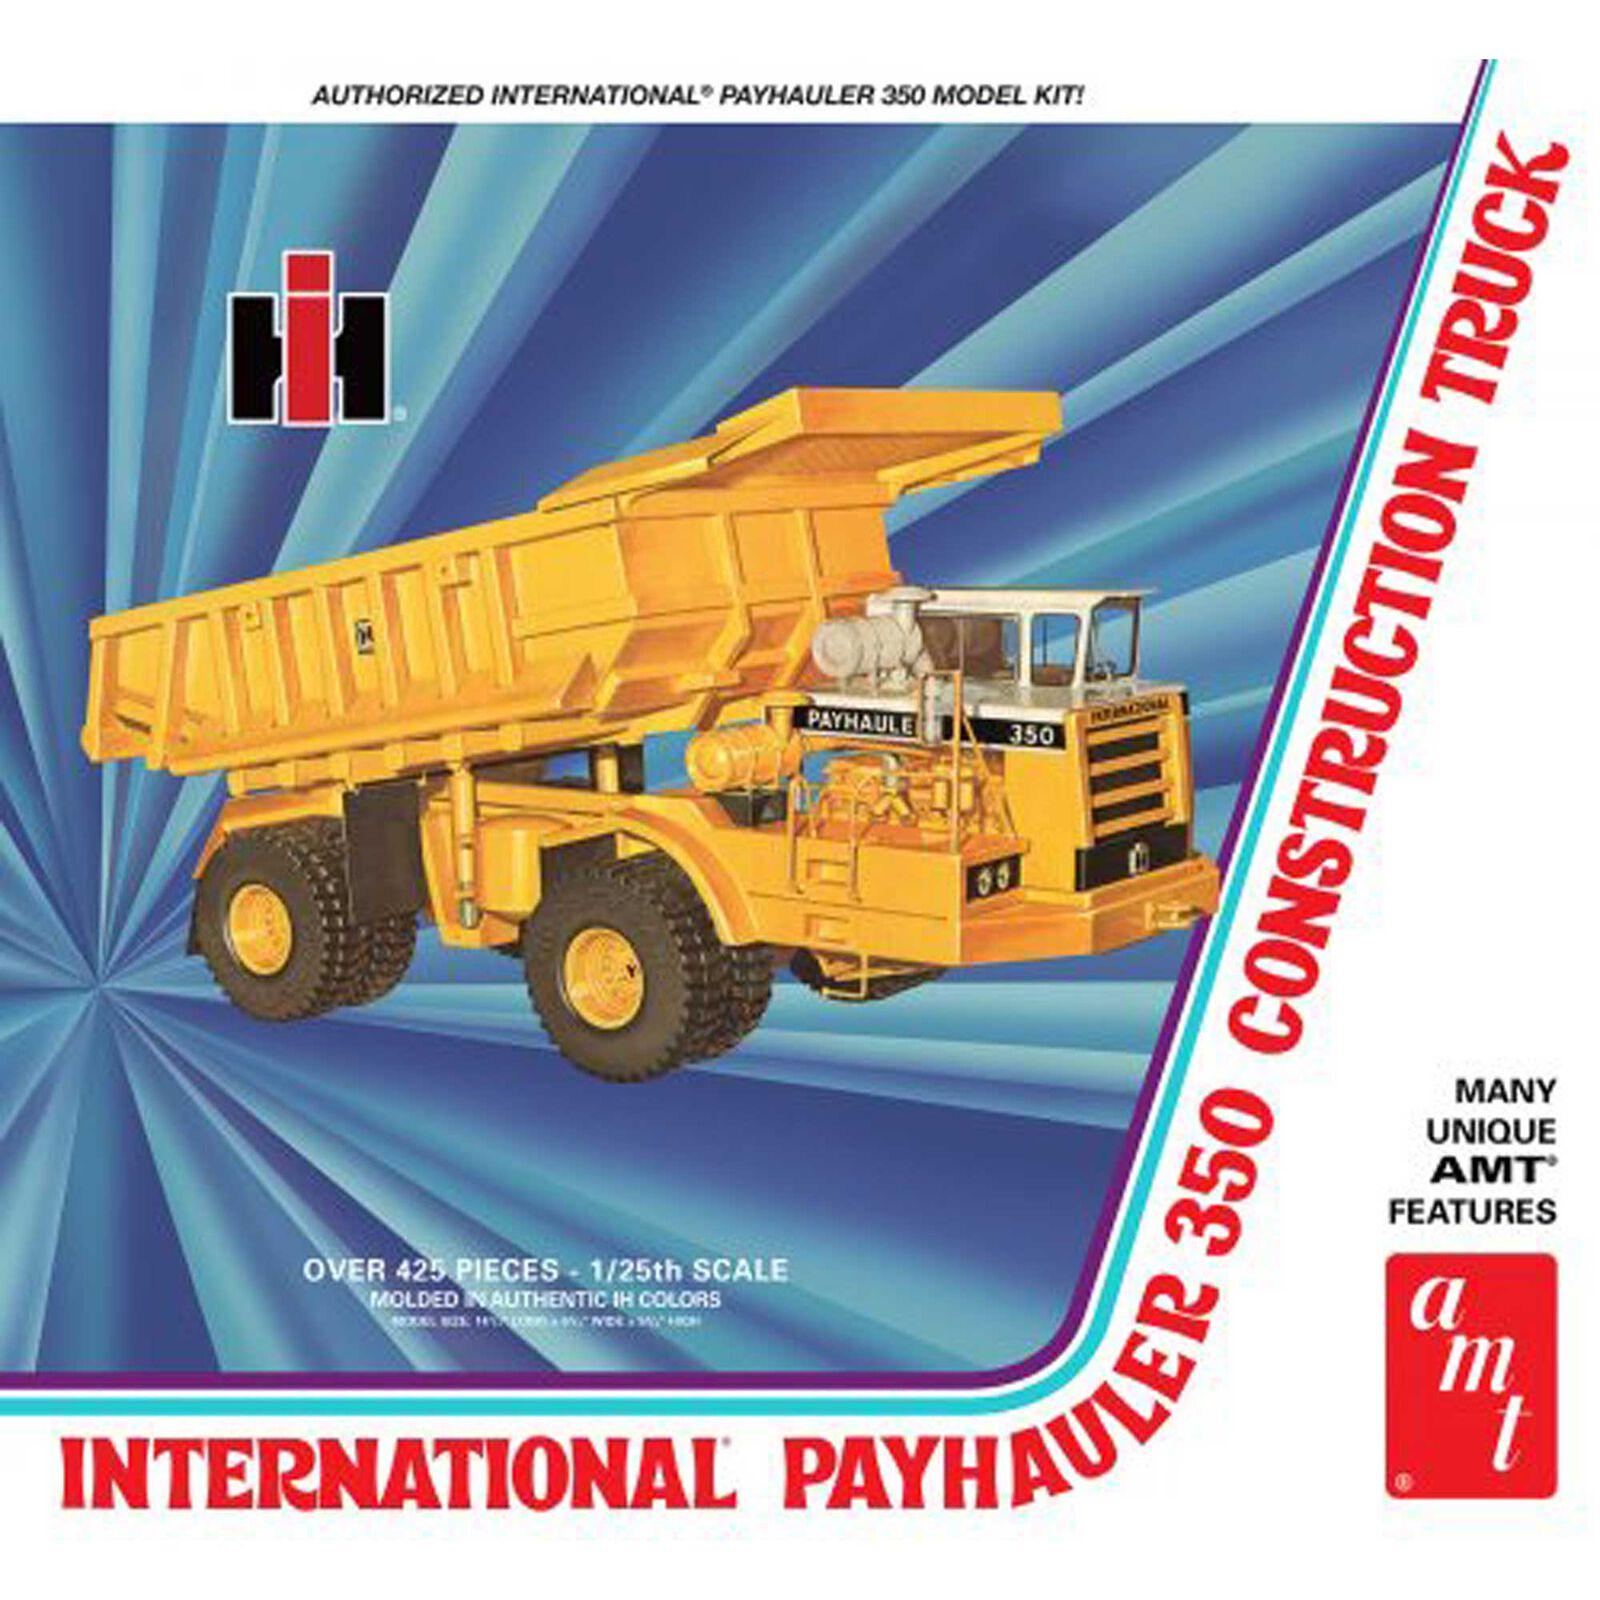 1/25 International Payhauler 350